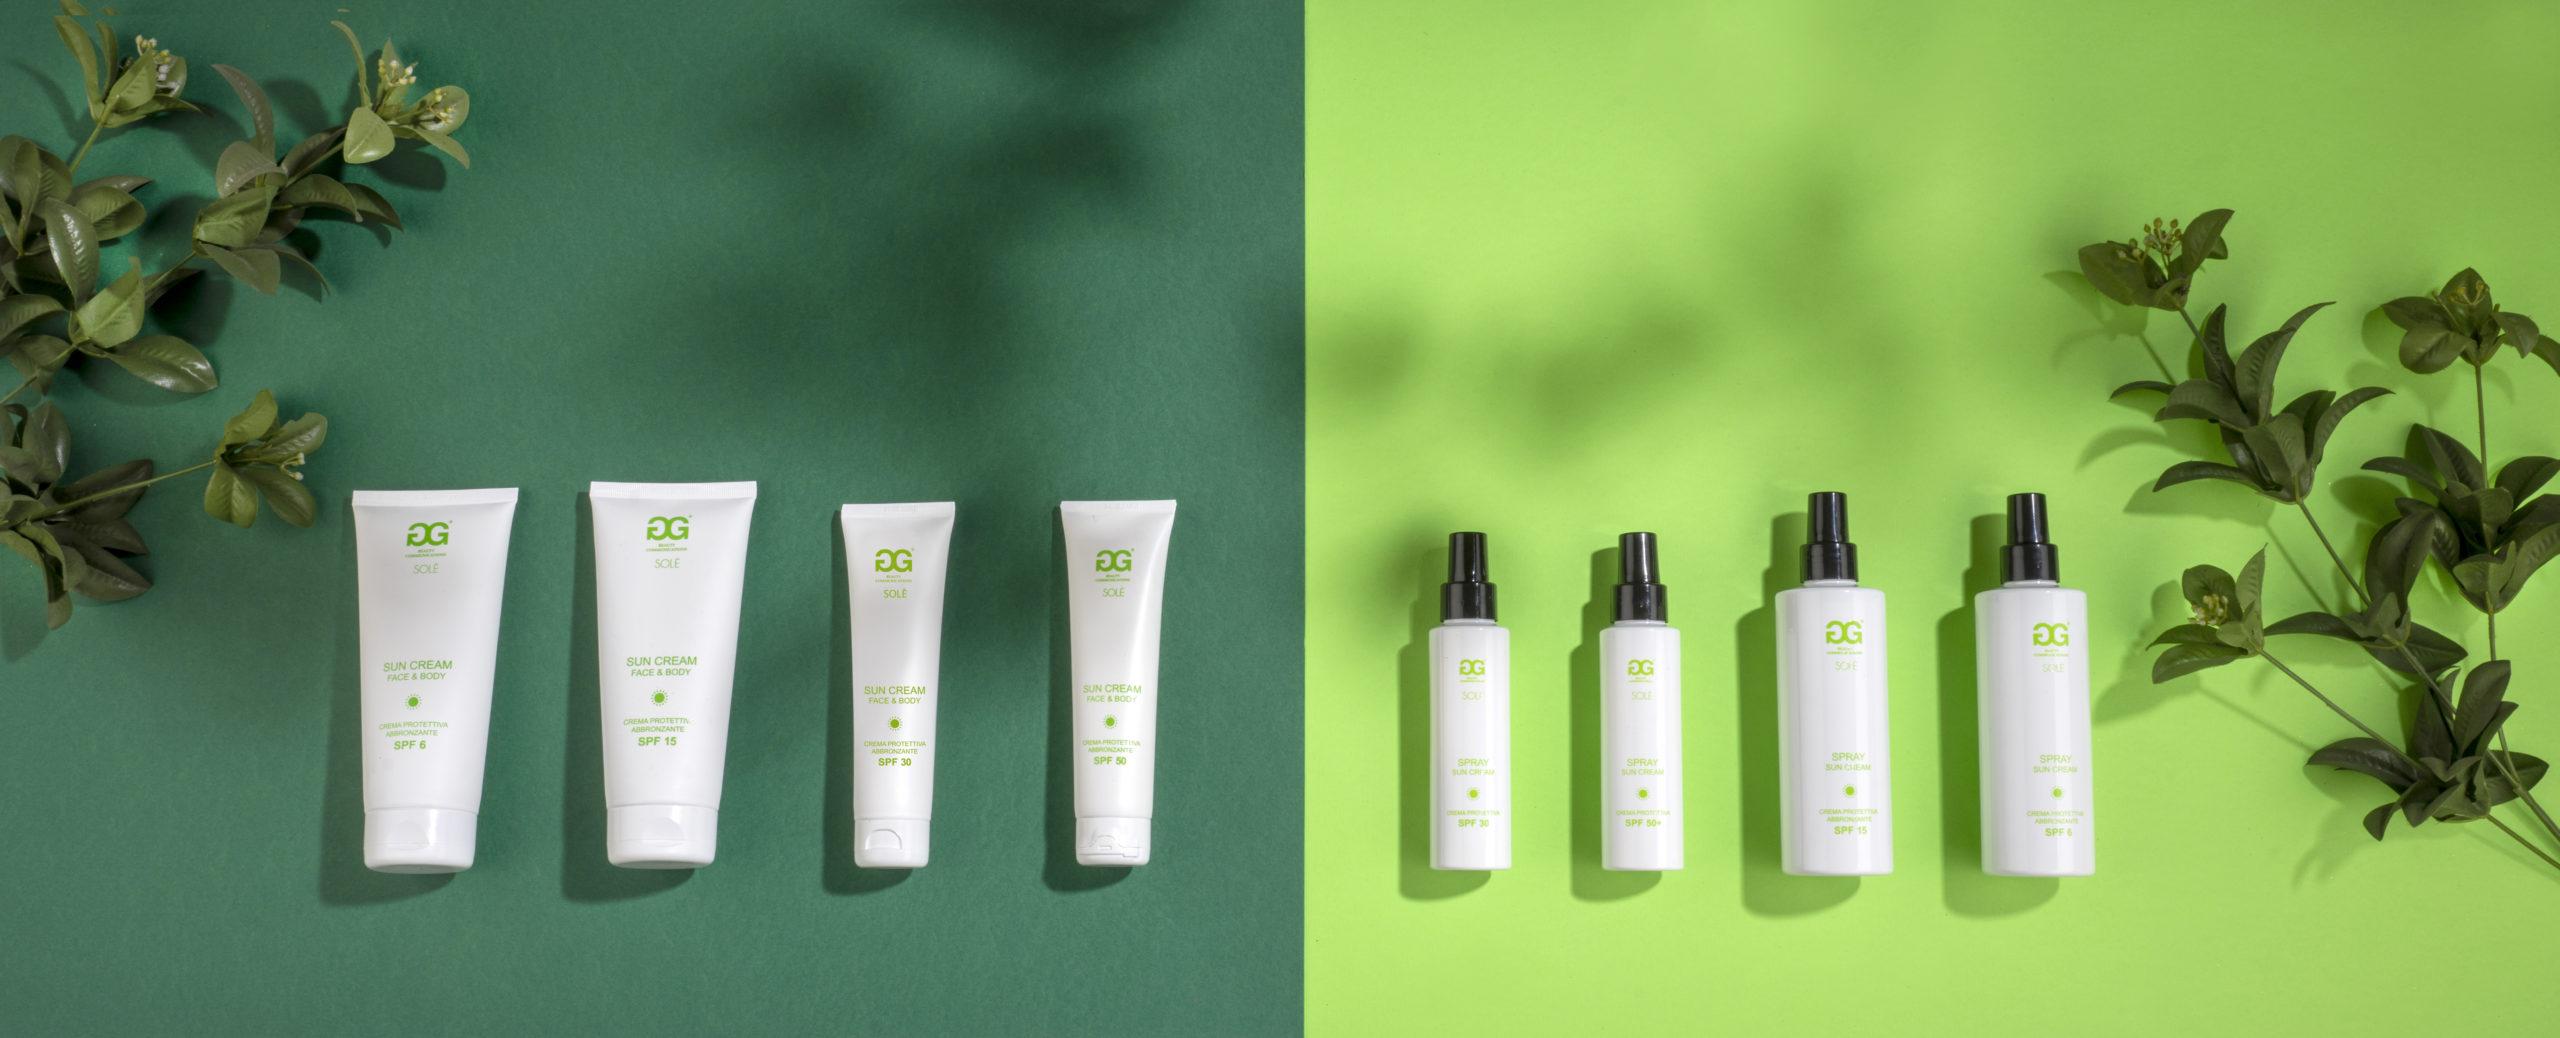 spf-spray-cosmetici-solari